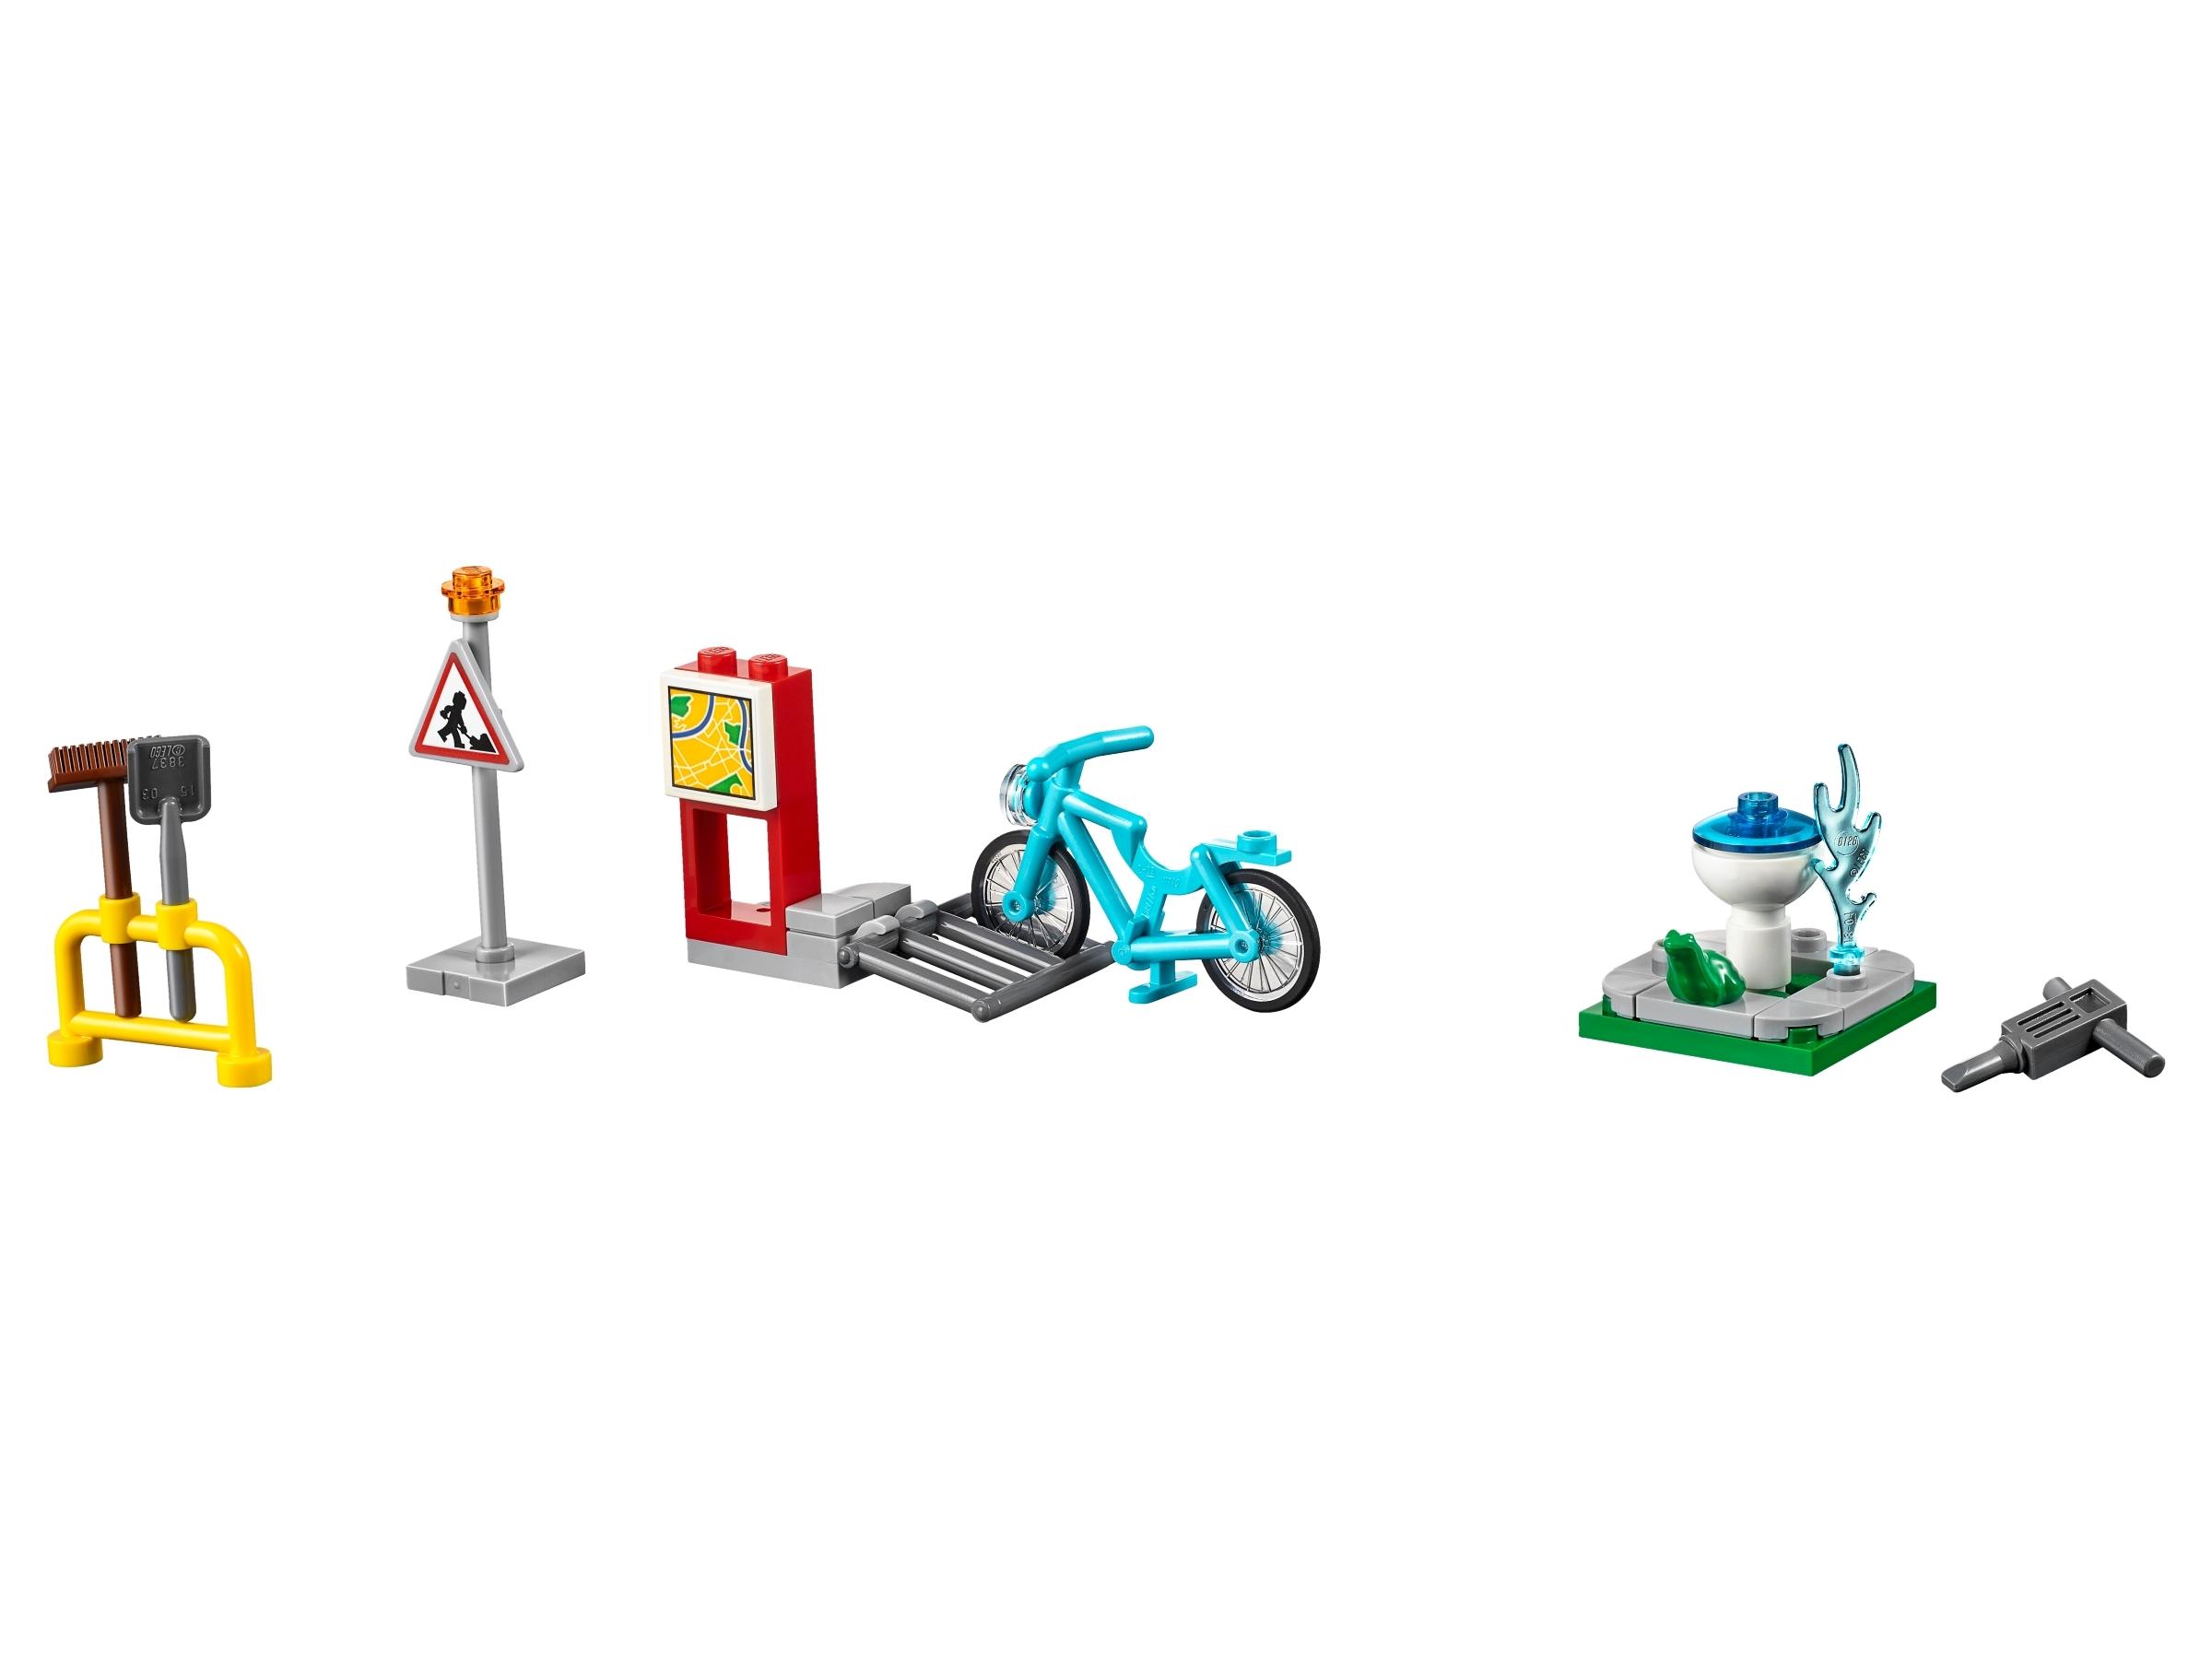 lego city bouw mijn stad accessoire set 40170